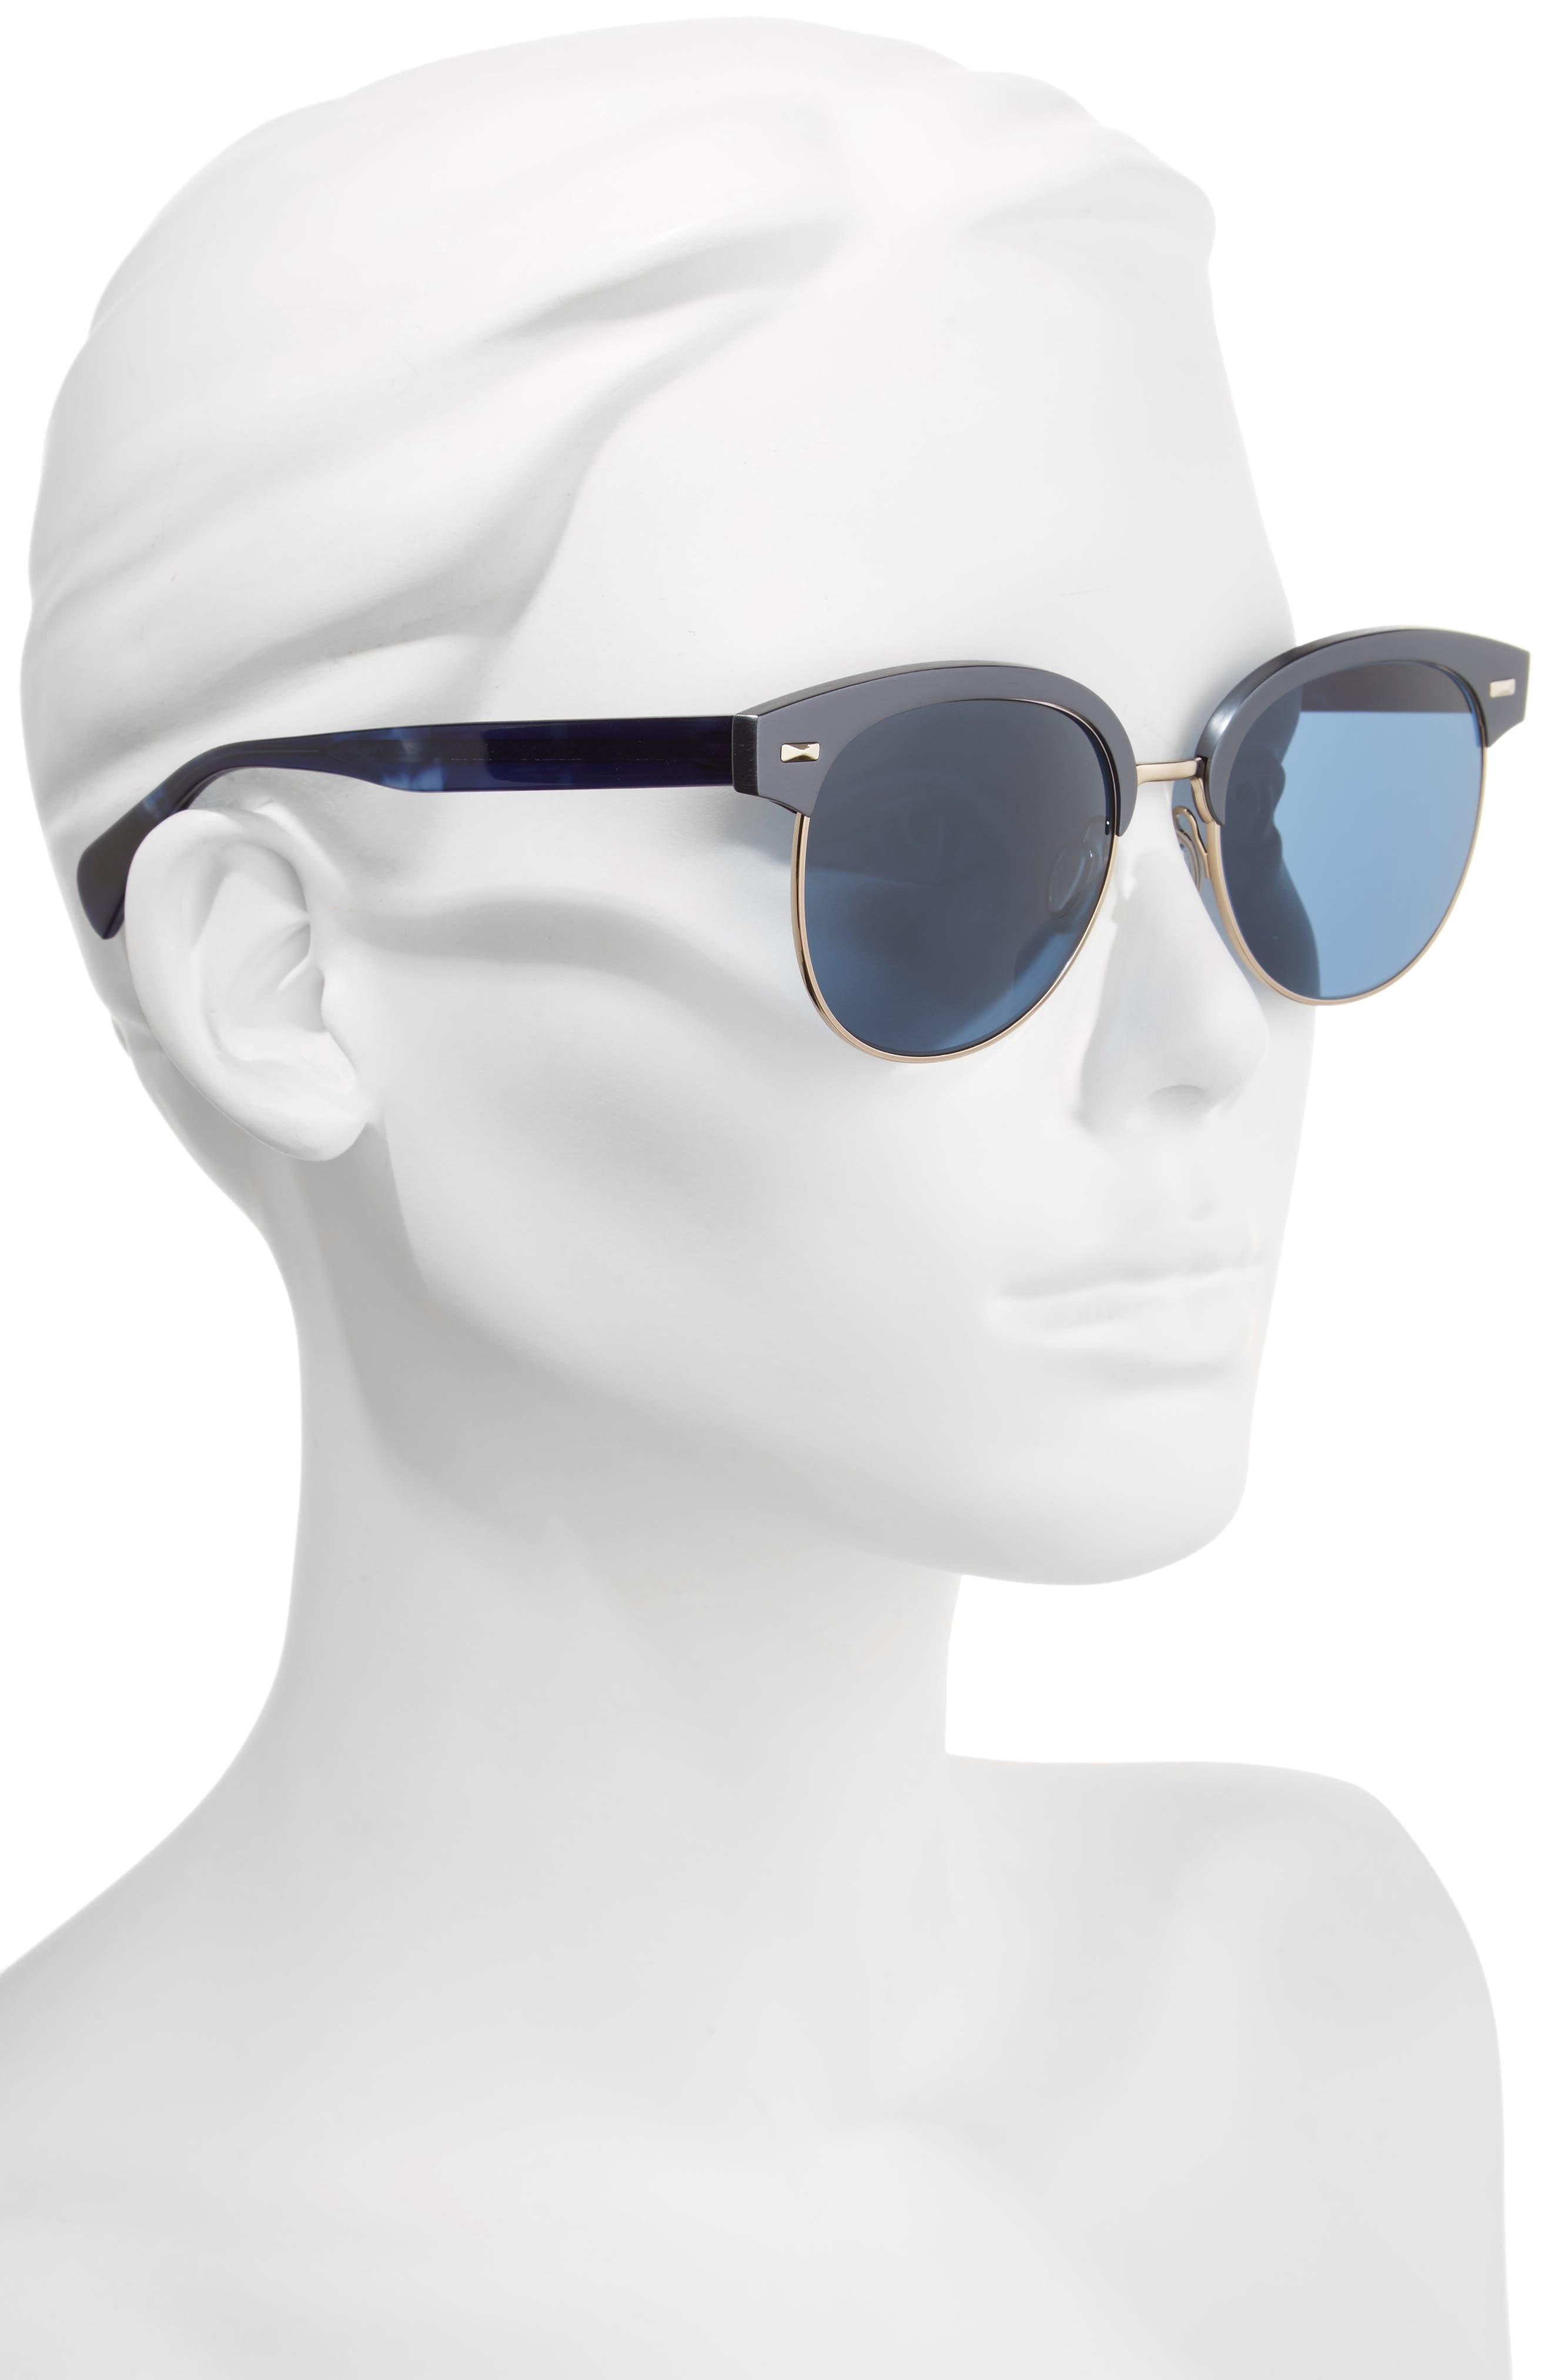 Alternate Image 2  - Oliver Peoples Shaelie 55mm Mirrored Semi-Rim Sunglasses